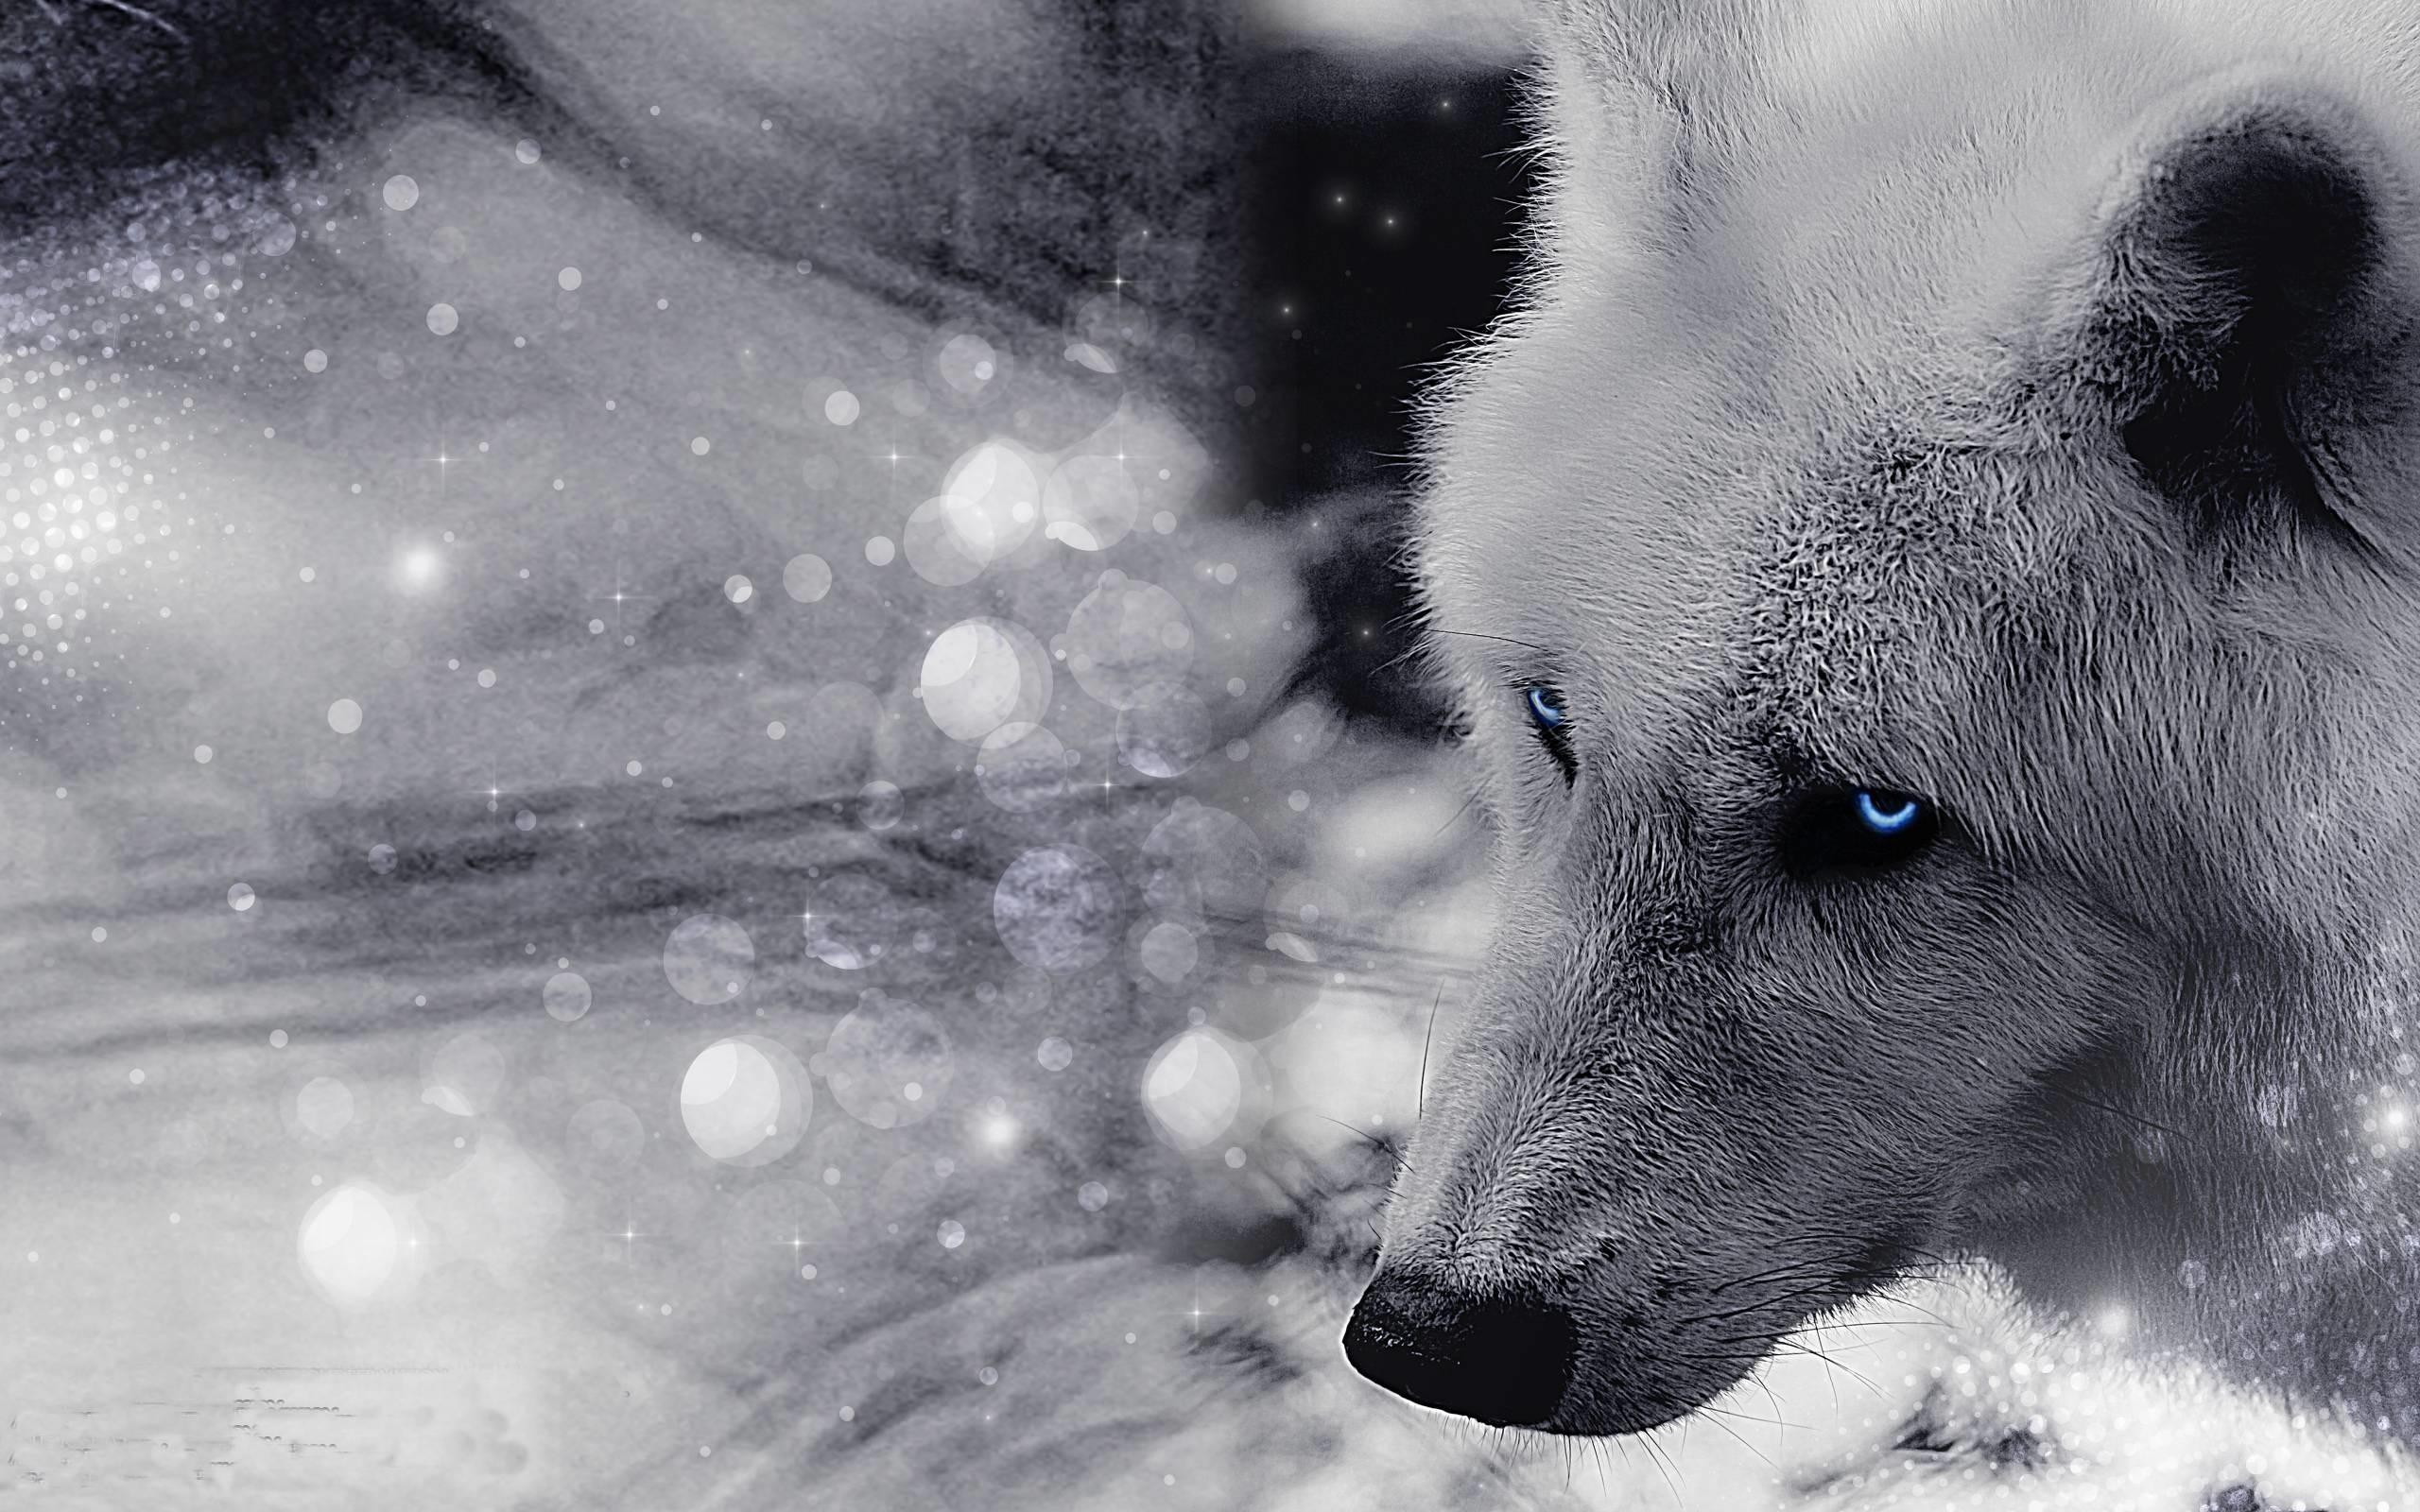 Wolf Desktop Backgrounds (69+ Images